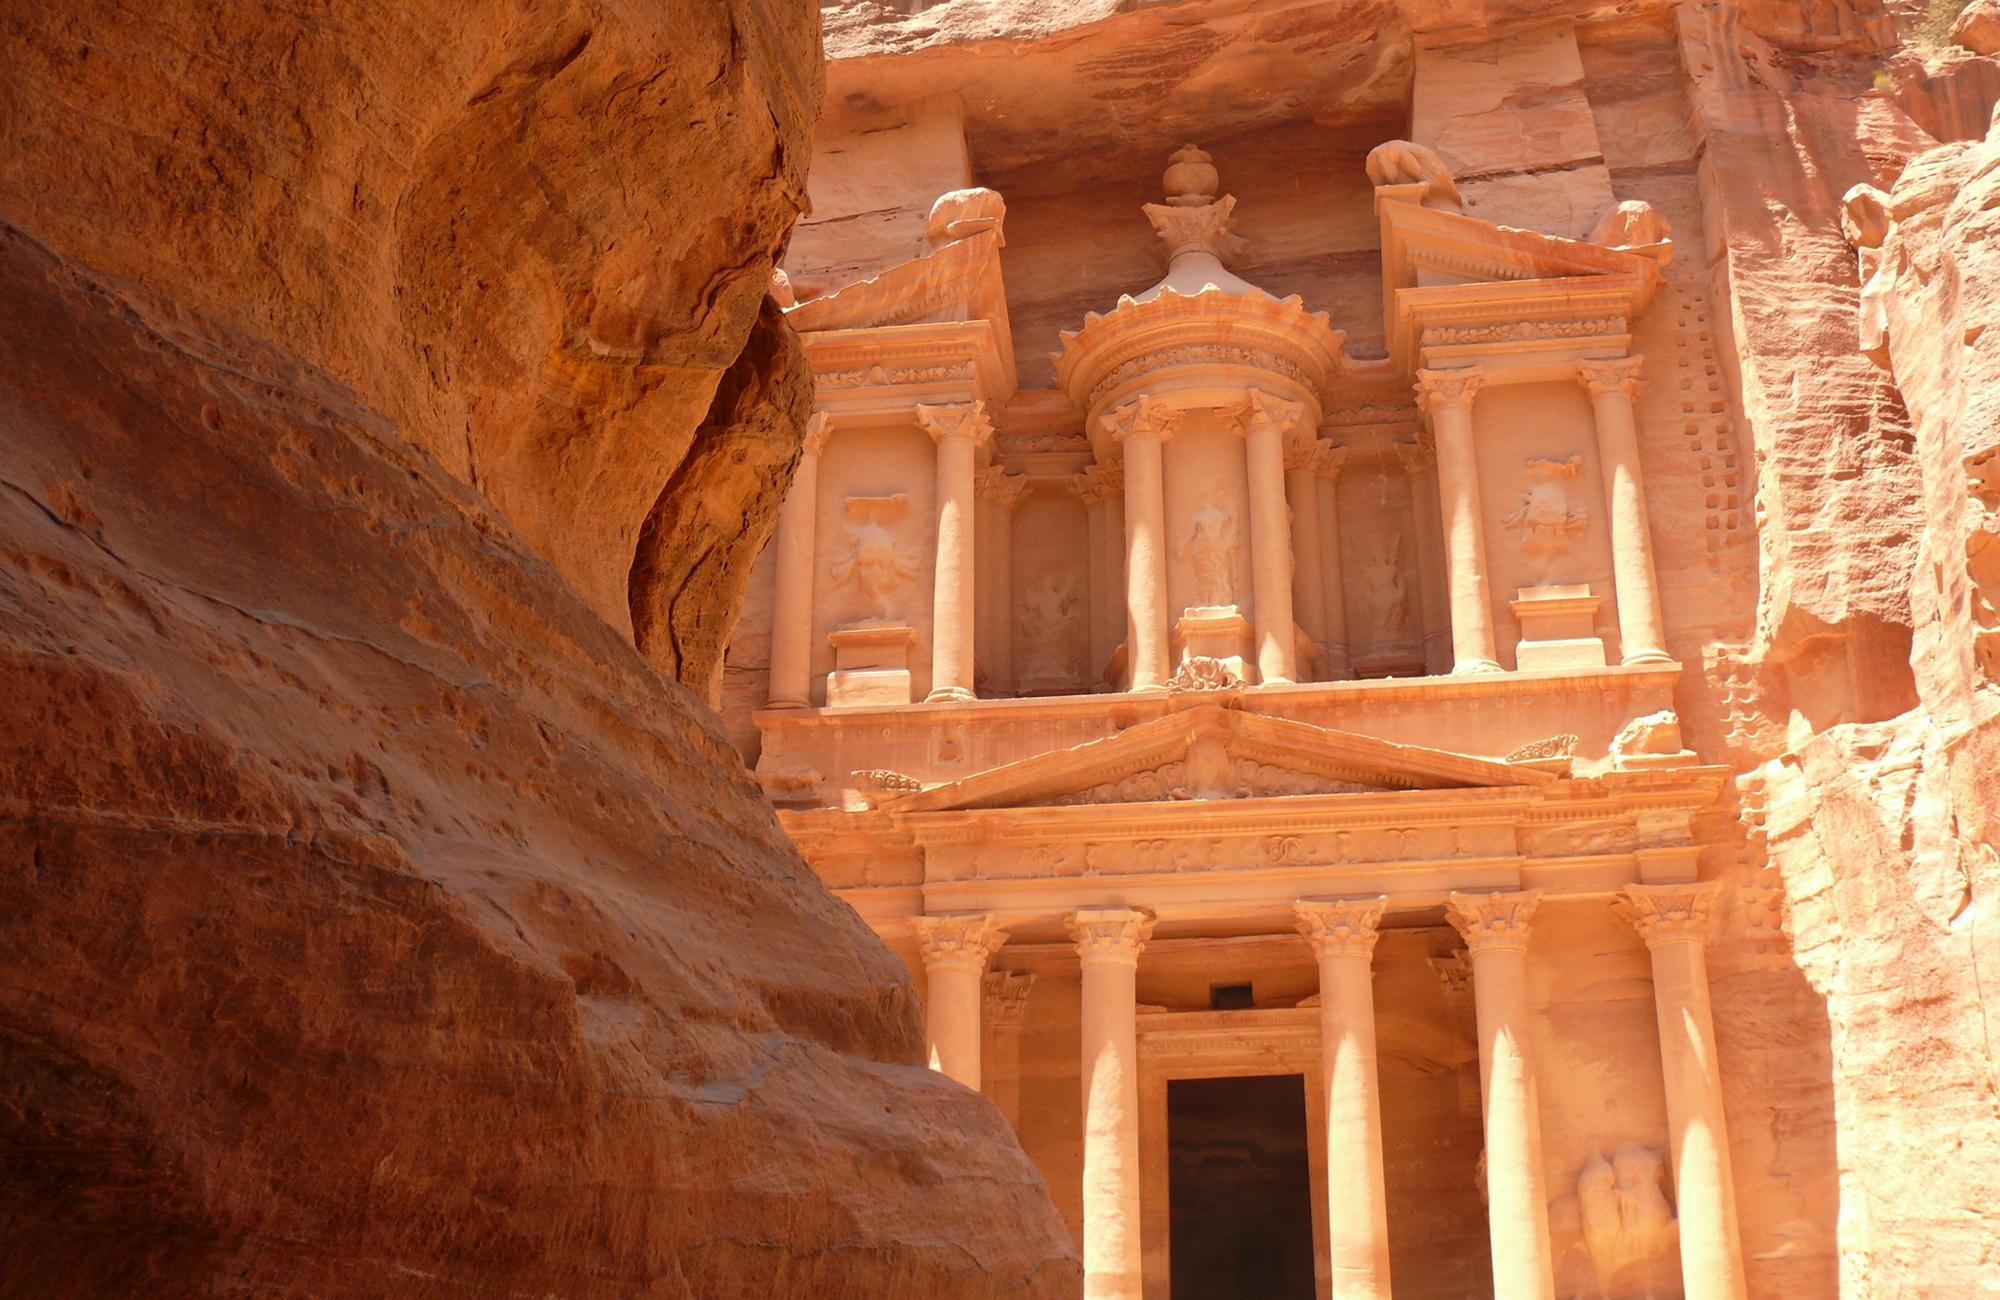 Jordanie-Petra-roche-Amplitudes